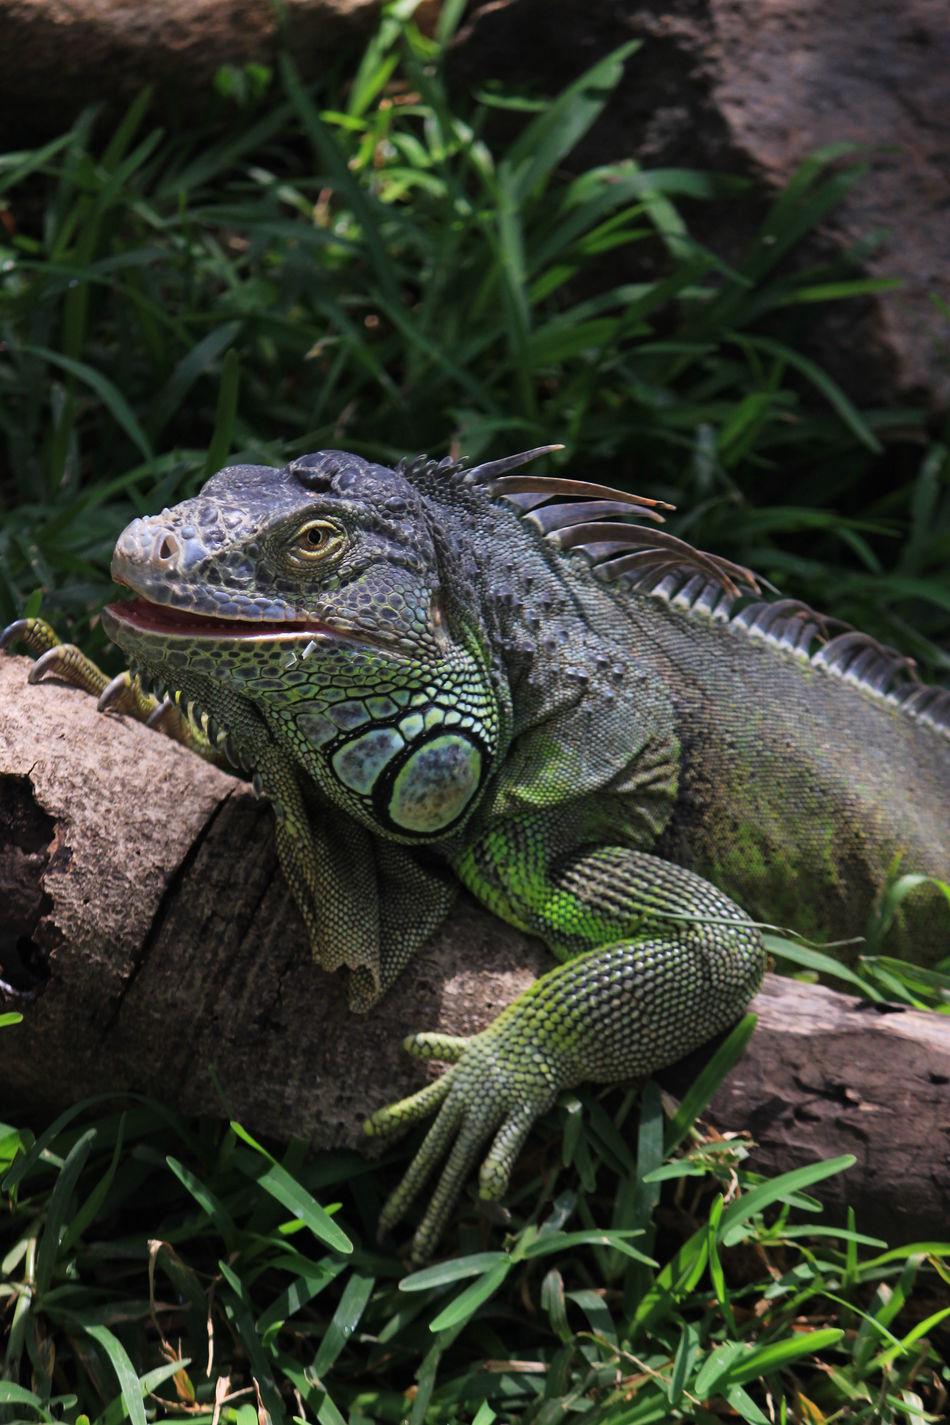 Creepy Raptor Iguanaa Iguana Love Iguana Crocodile Park ECR Green